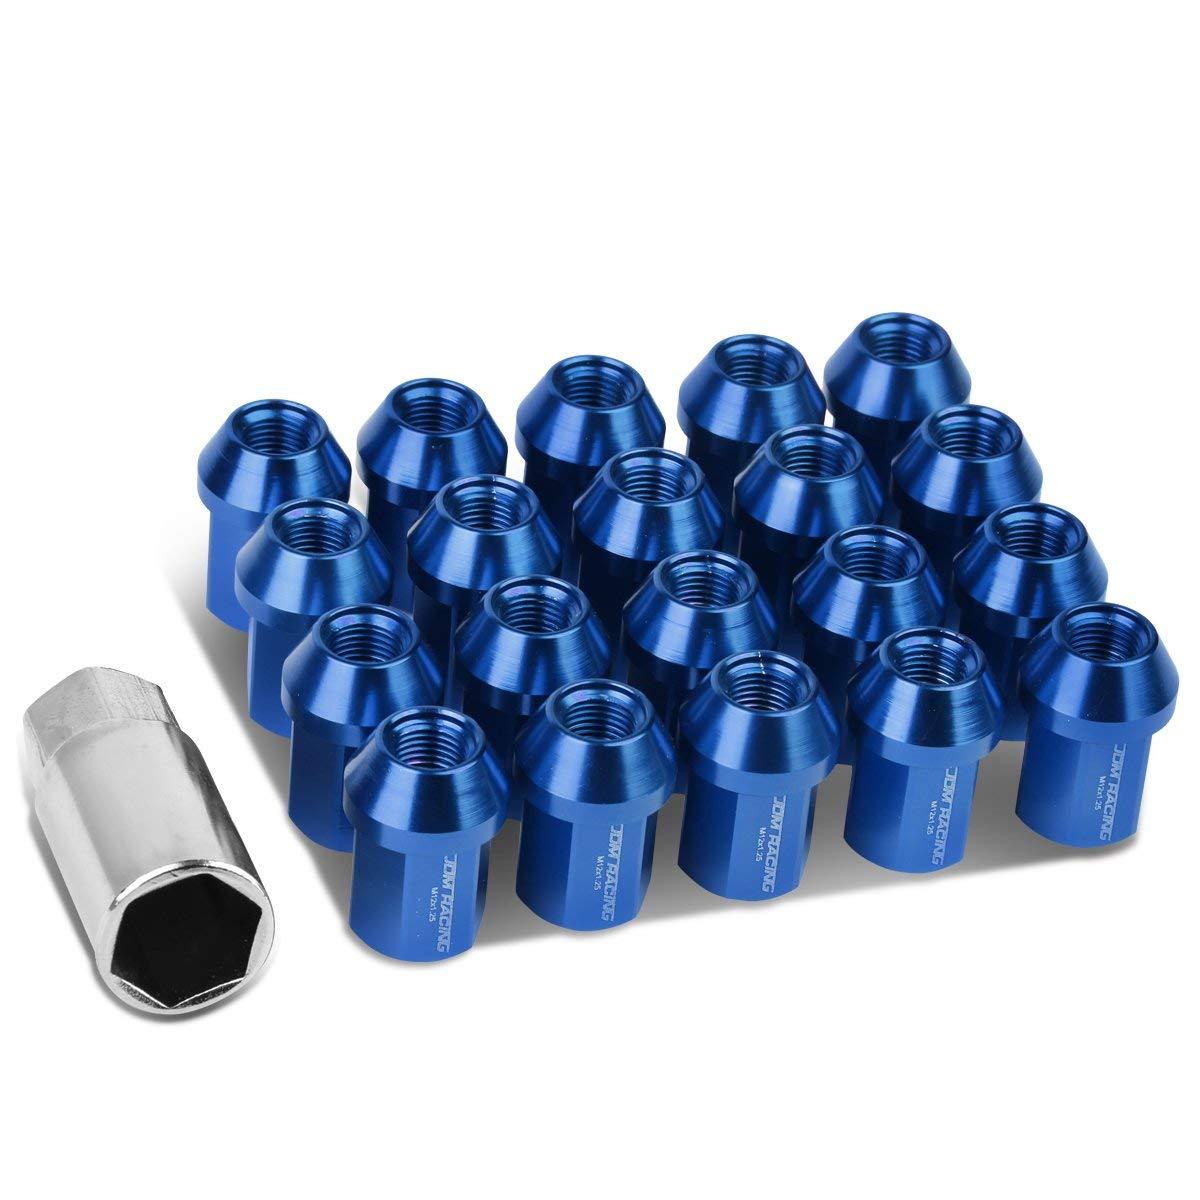 Gorilla Automotive 40037BL Acorn Bulge Open End Blue Lug Nuts 12mm x 1.50 Thread Size